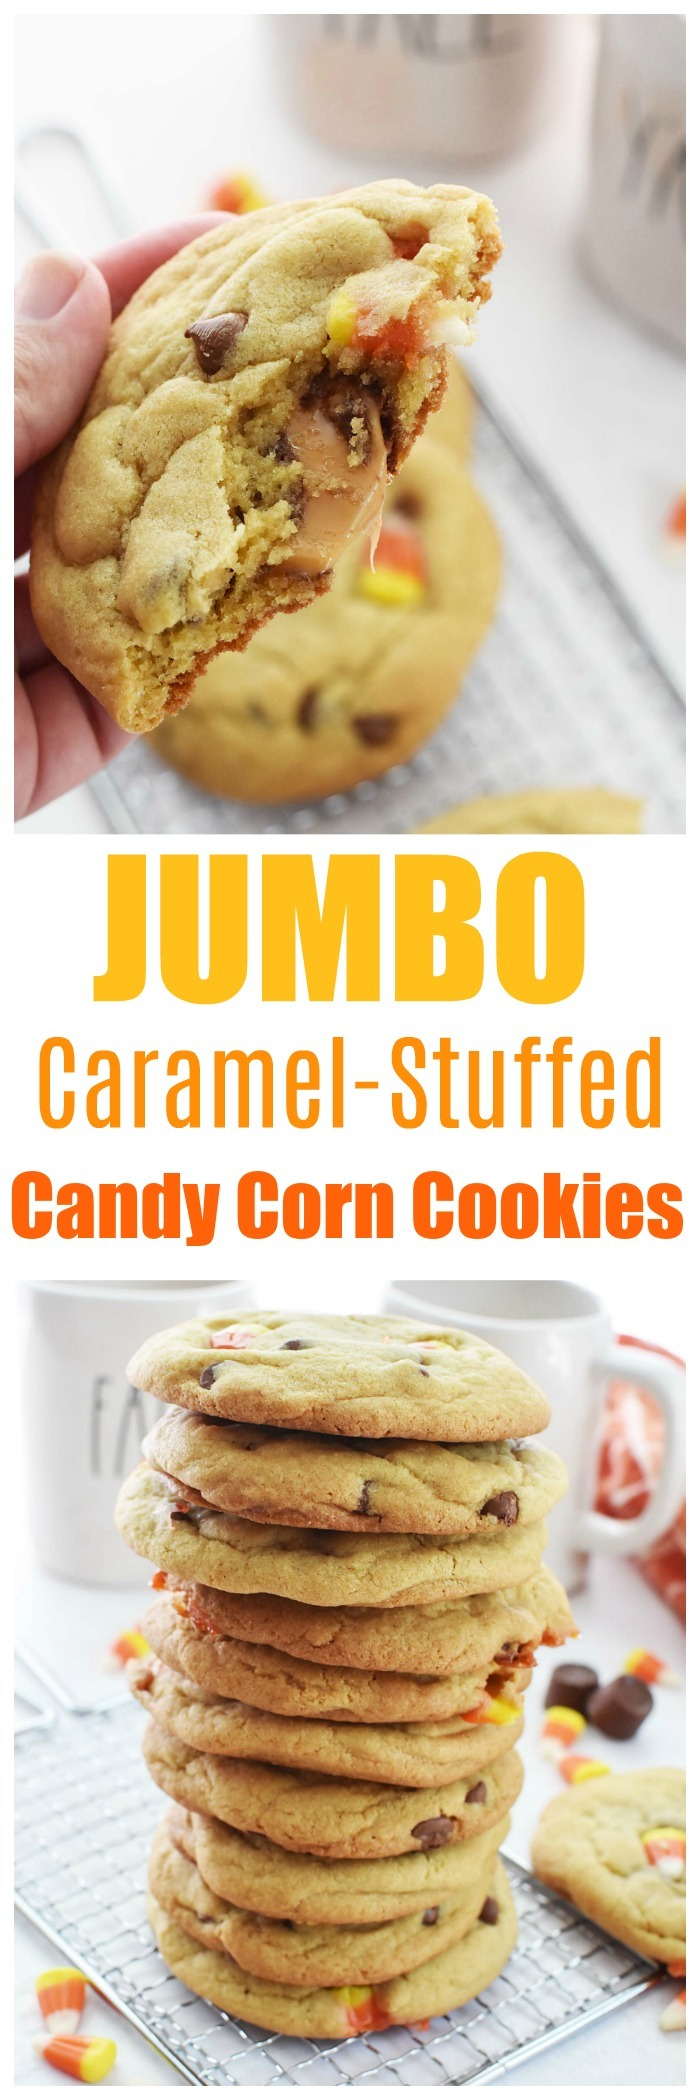 Caramel Stuffed Candy Corn Cookies